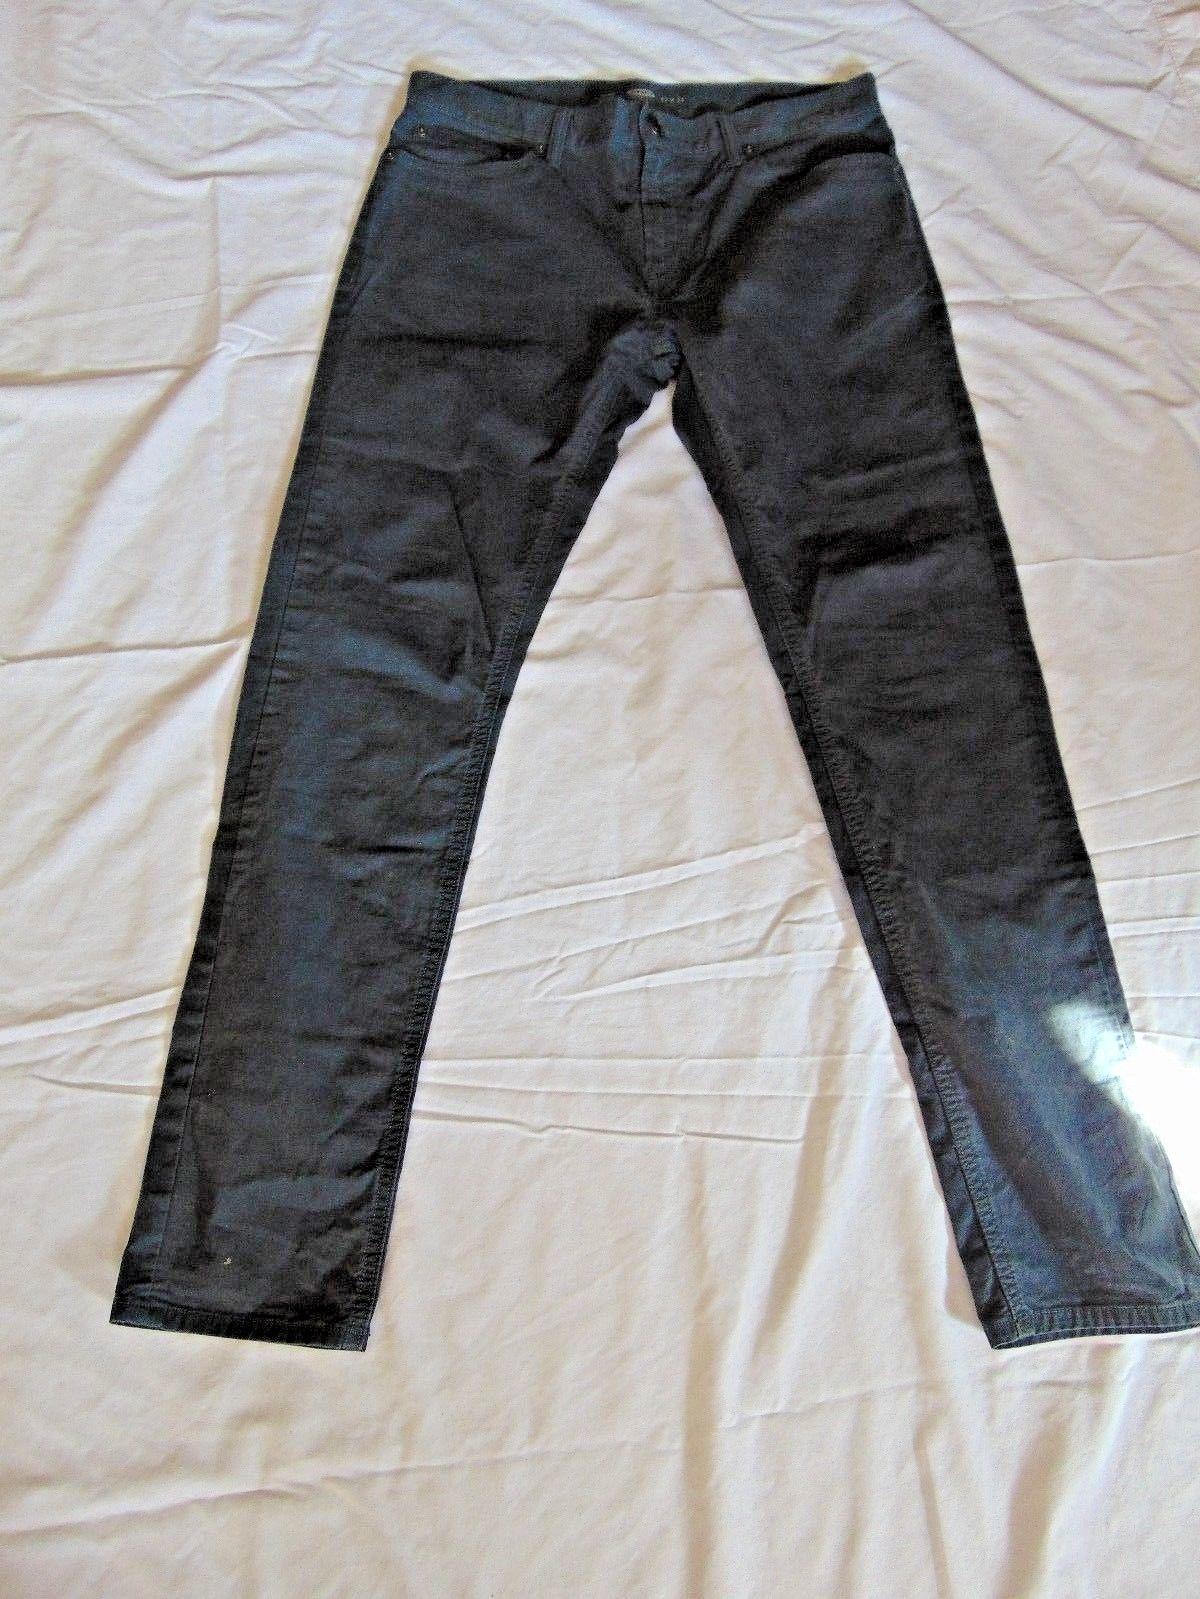 799dbb29b82 Old Navy 3 Assorted Men s Khaki Dress Pants RN 54023 Size 32 x 32 Actual  Size